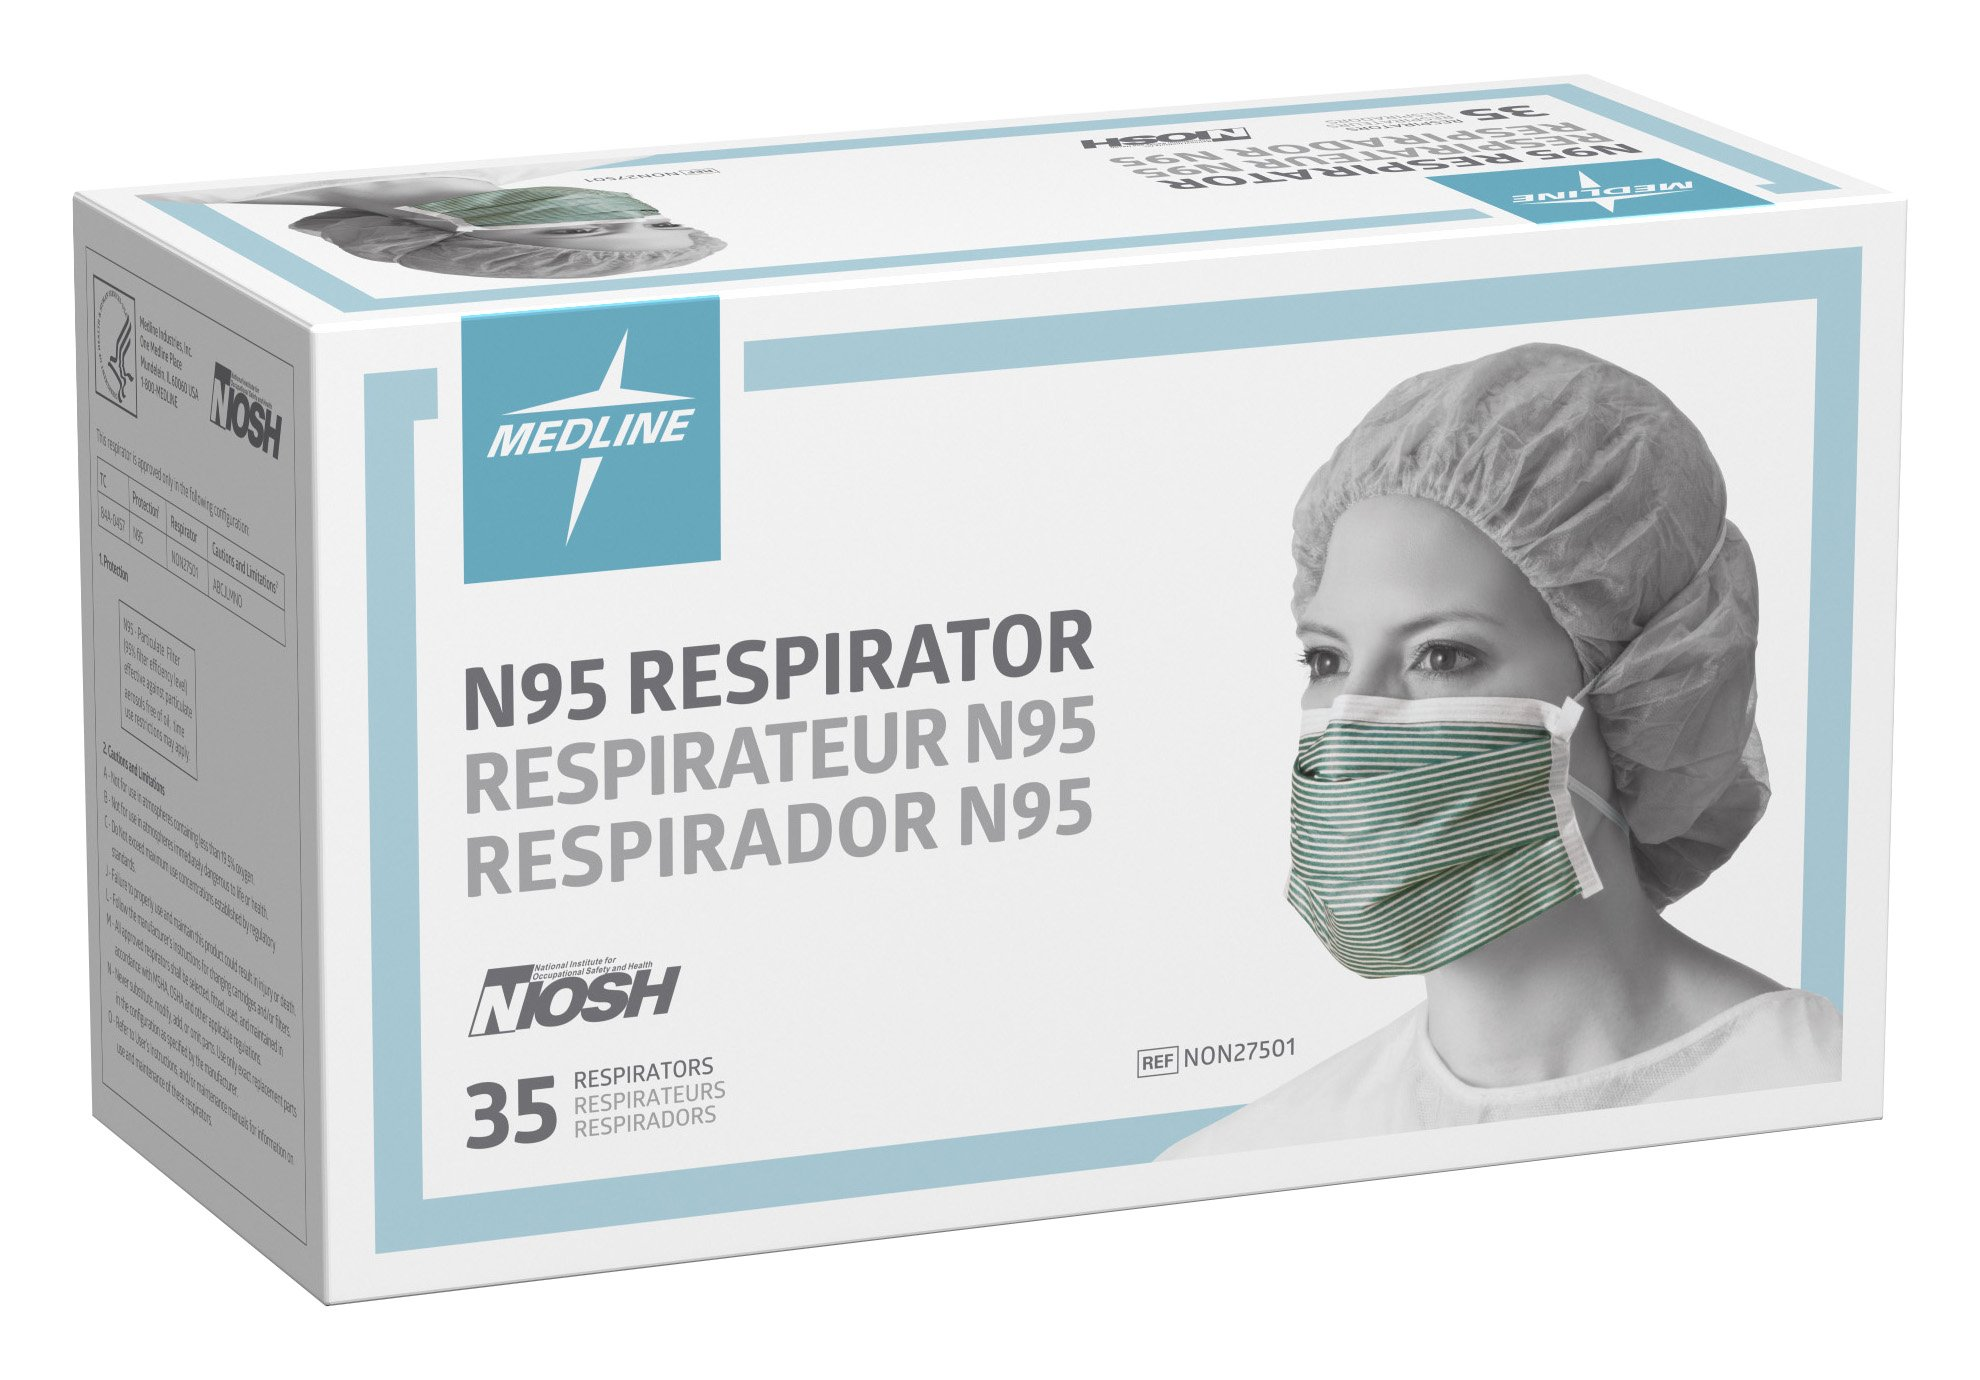 Medline NON27501 N95 Flat Fold Respirator Masks, Cellulose, Latex Free, White/Green (Pack of 210) by Medline (Image #2)